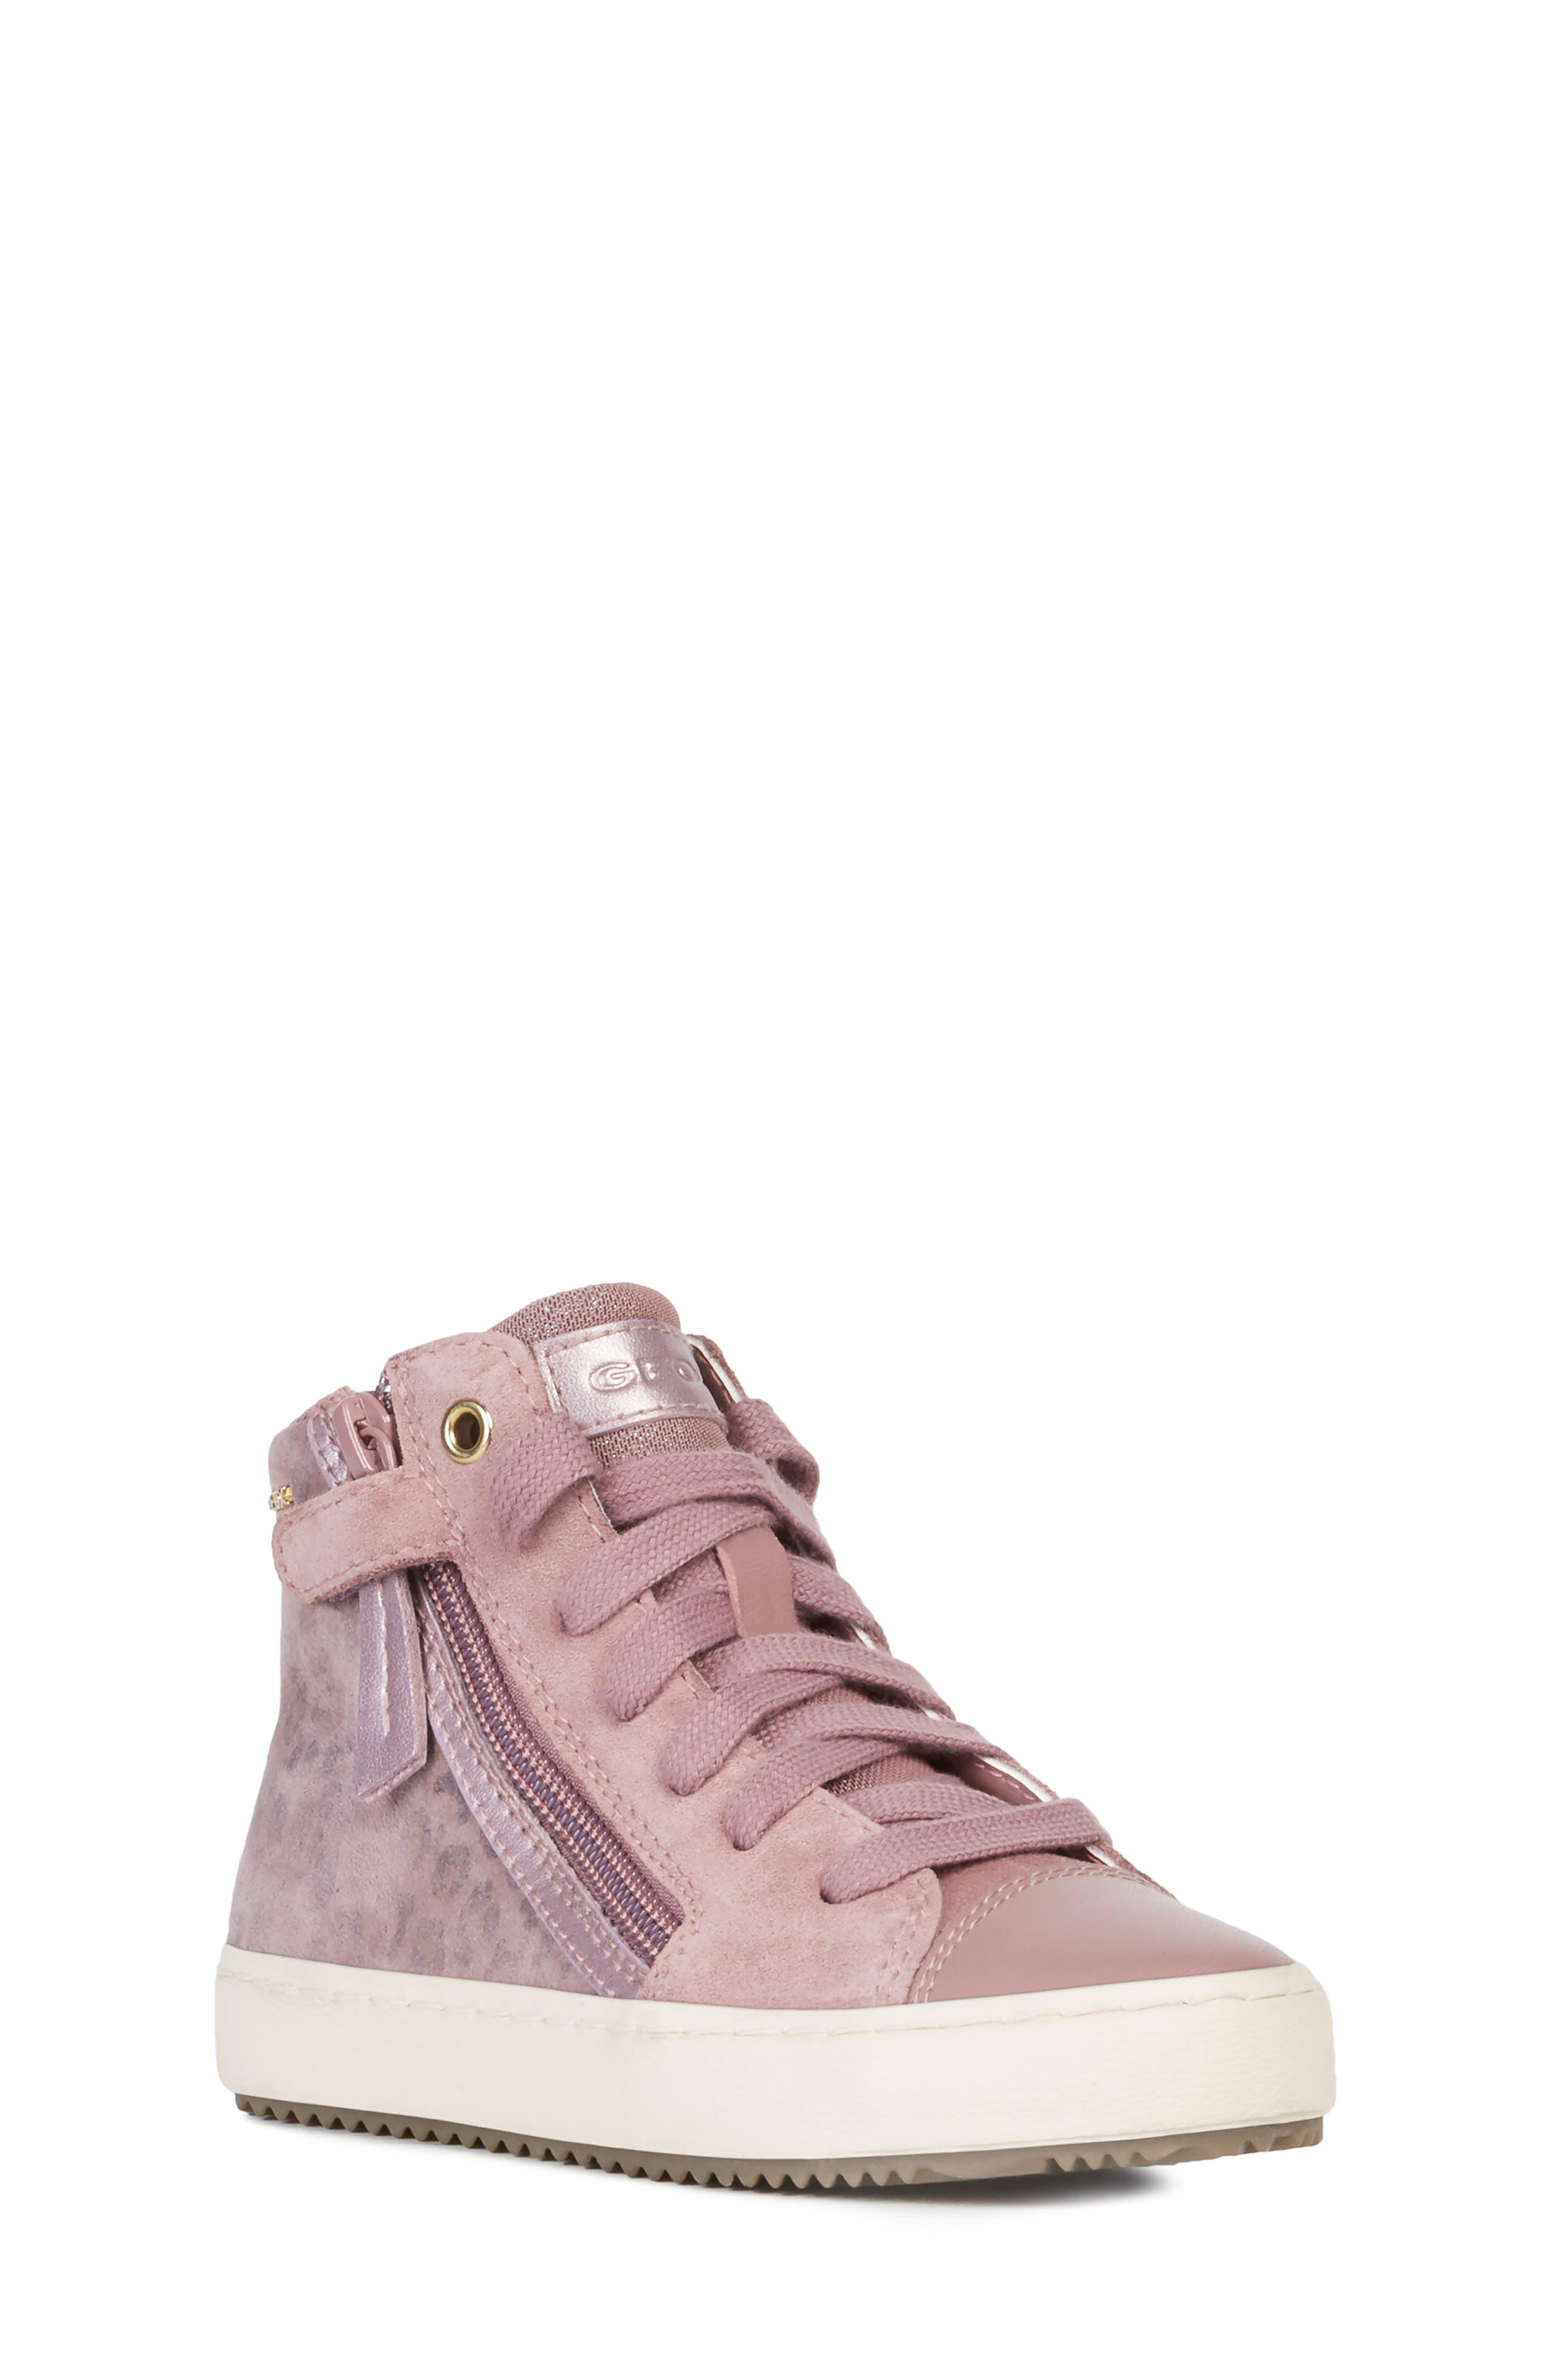 Girls Geox Kalispera HighTop Sneaker Size 4US  36EU  Pink